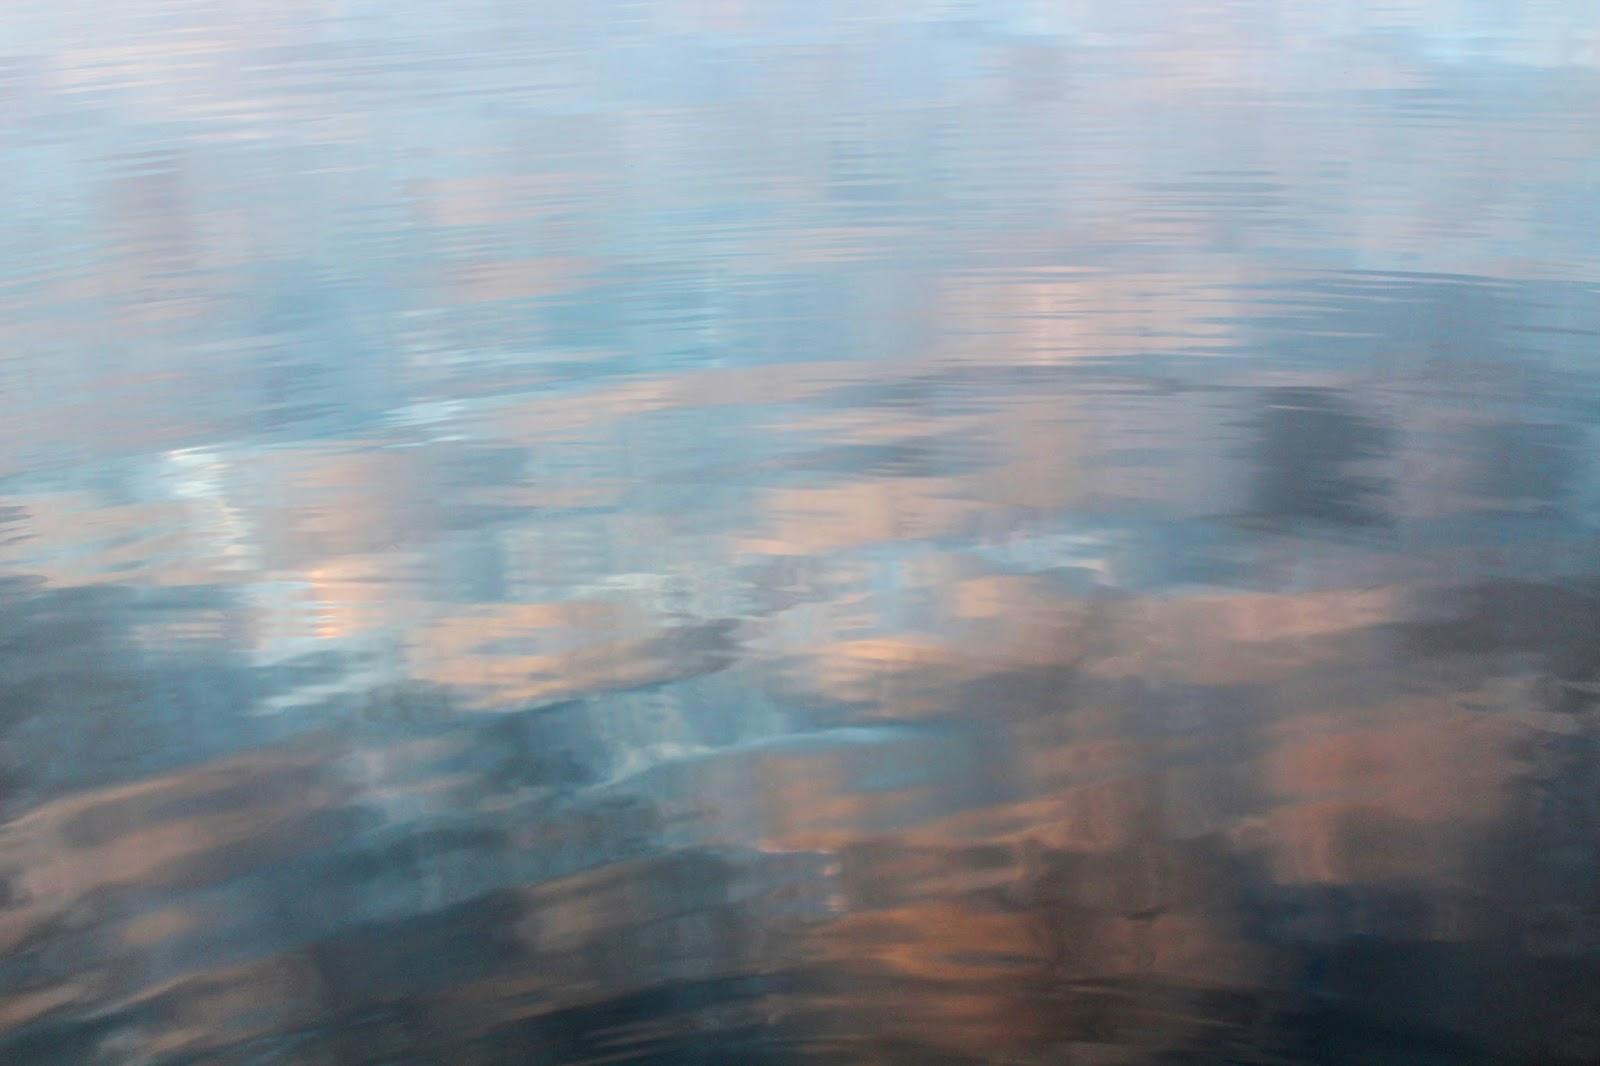 #lake #Saimaa #sea #mirror #reflection #sky